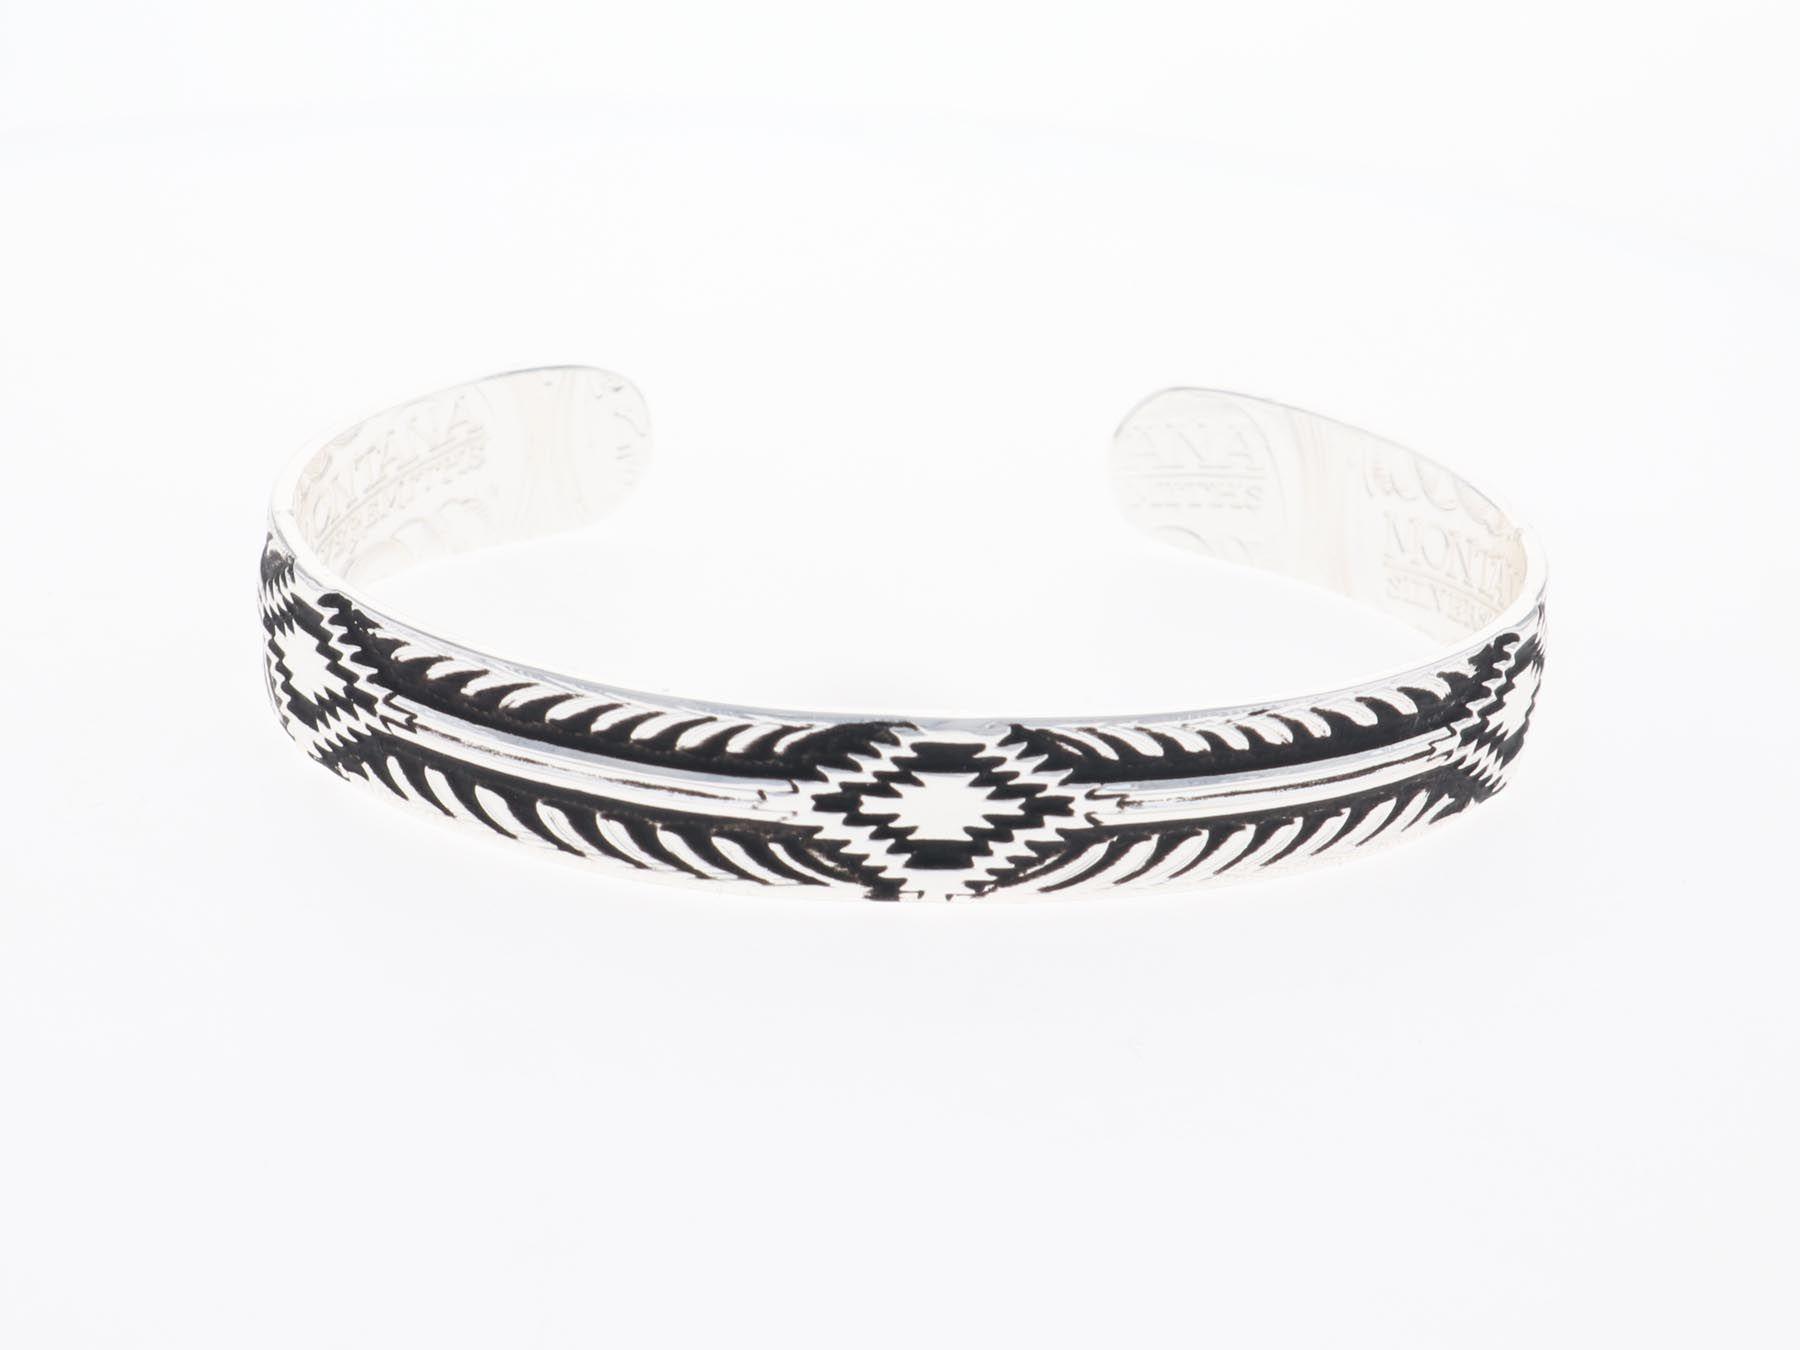 Midnights Steppes Narrow Cuff Bracelet